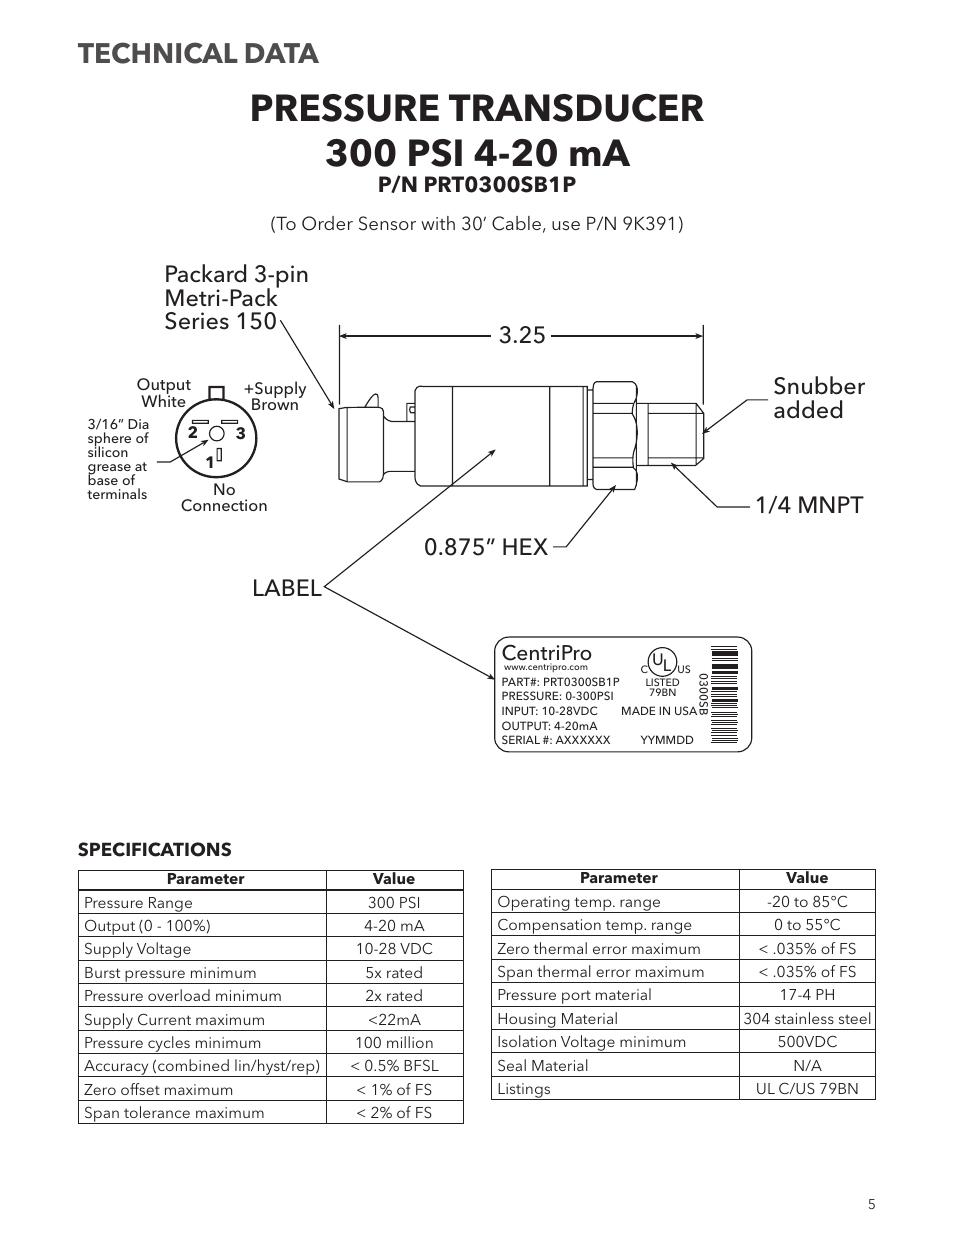 medium resolution of technical data centripro xylem adden600v r1 aquavar cpc centrifugal pump control 600 volt addendum user manual page 5 8